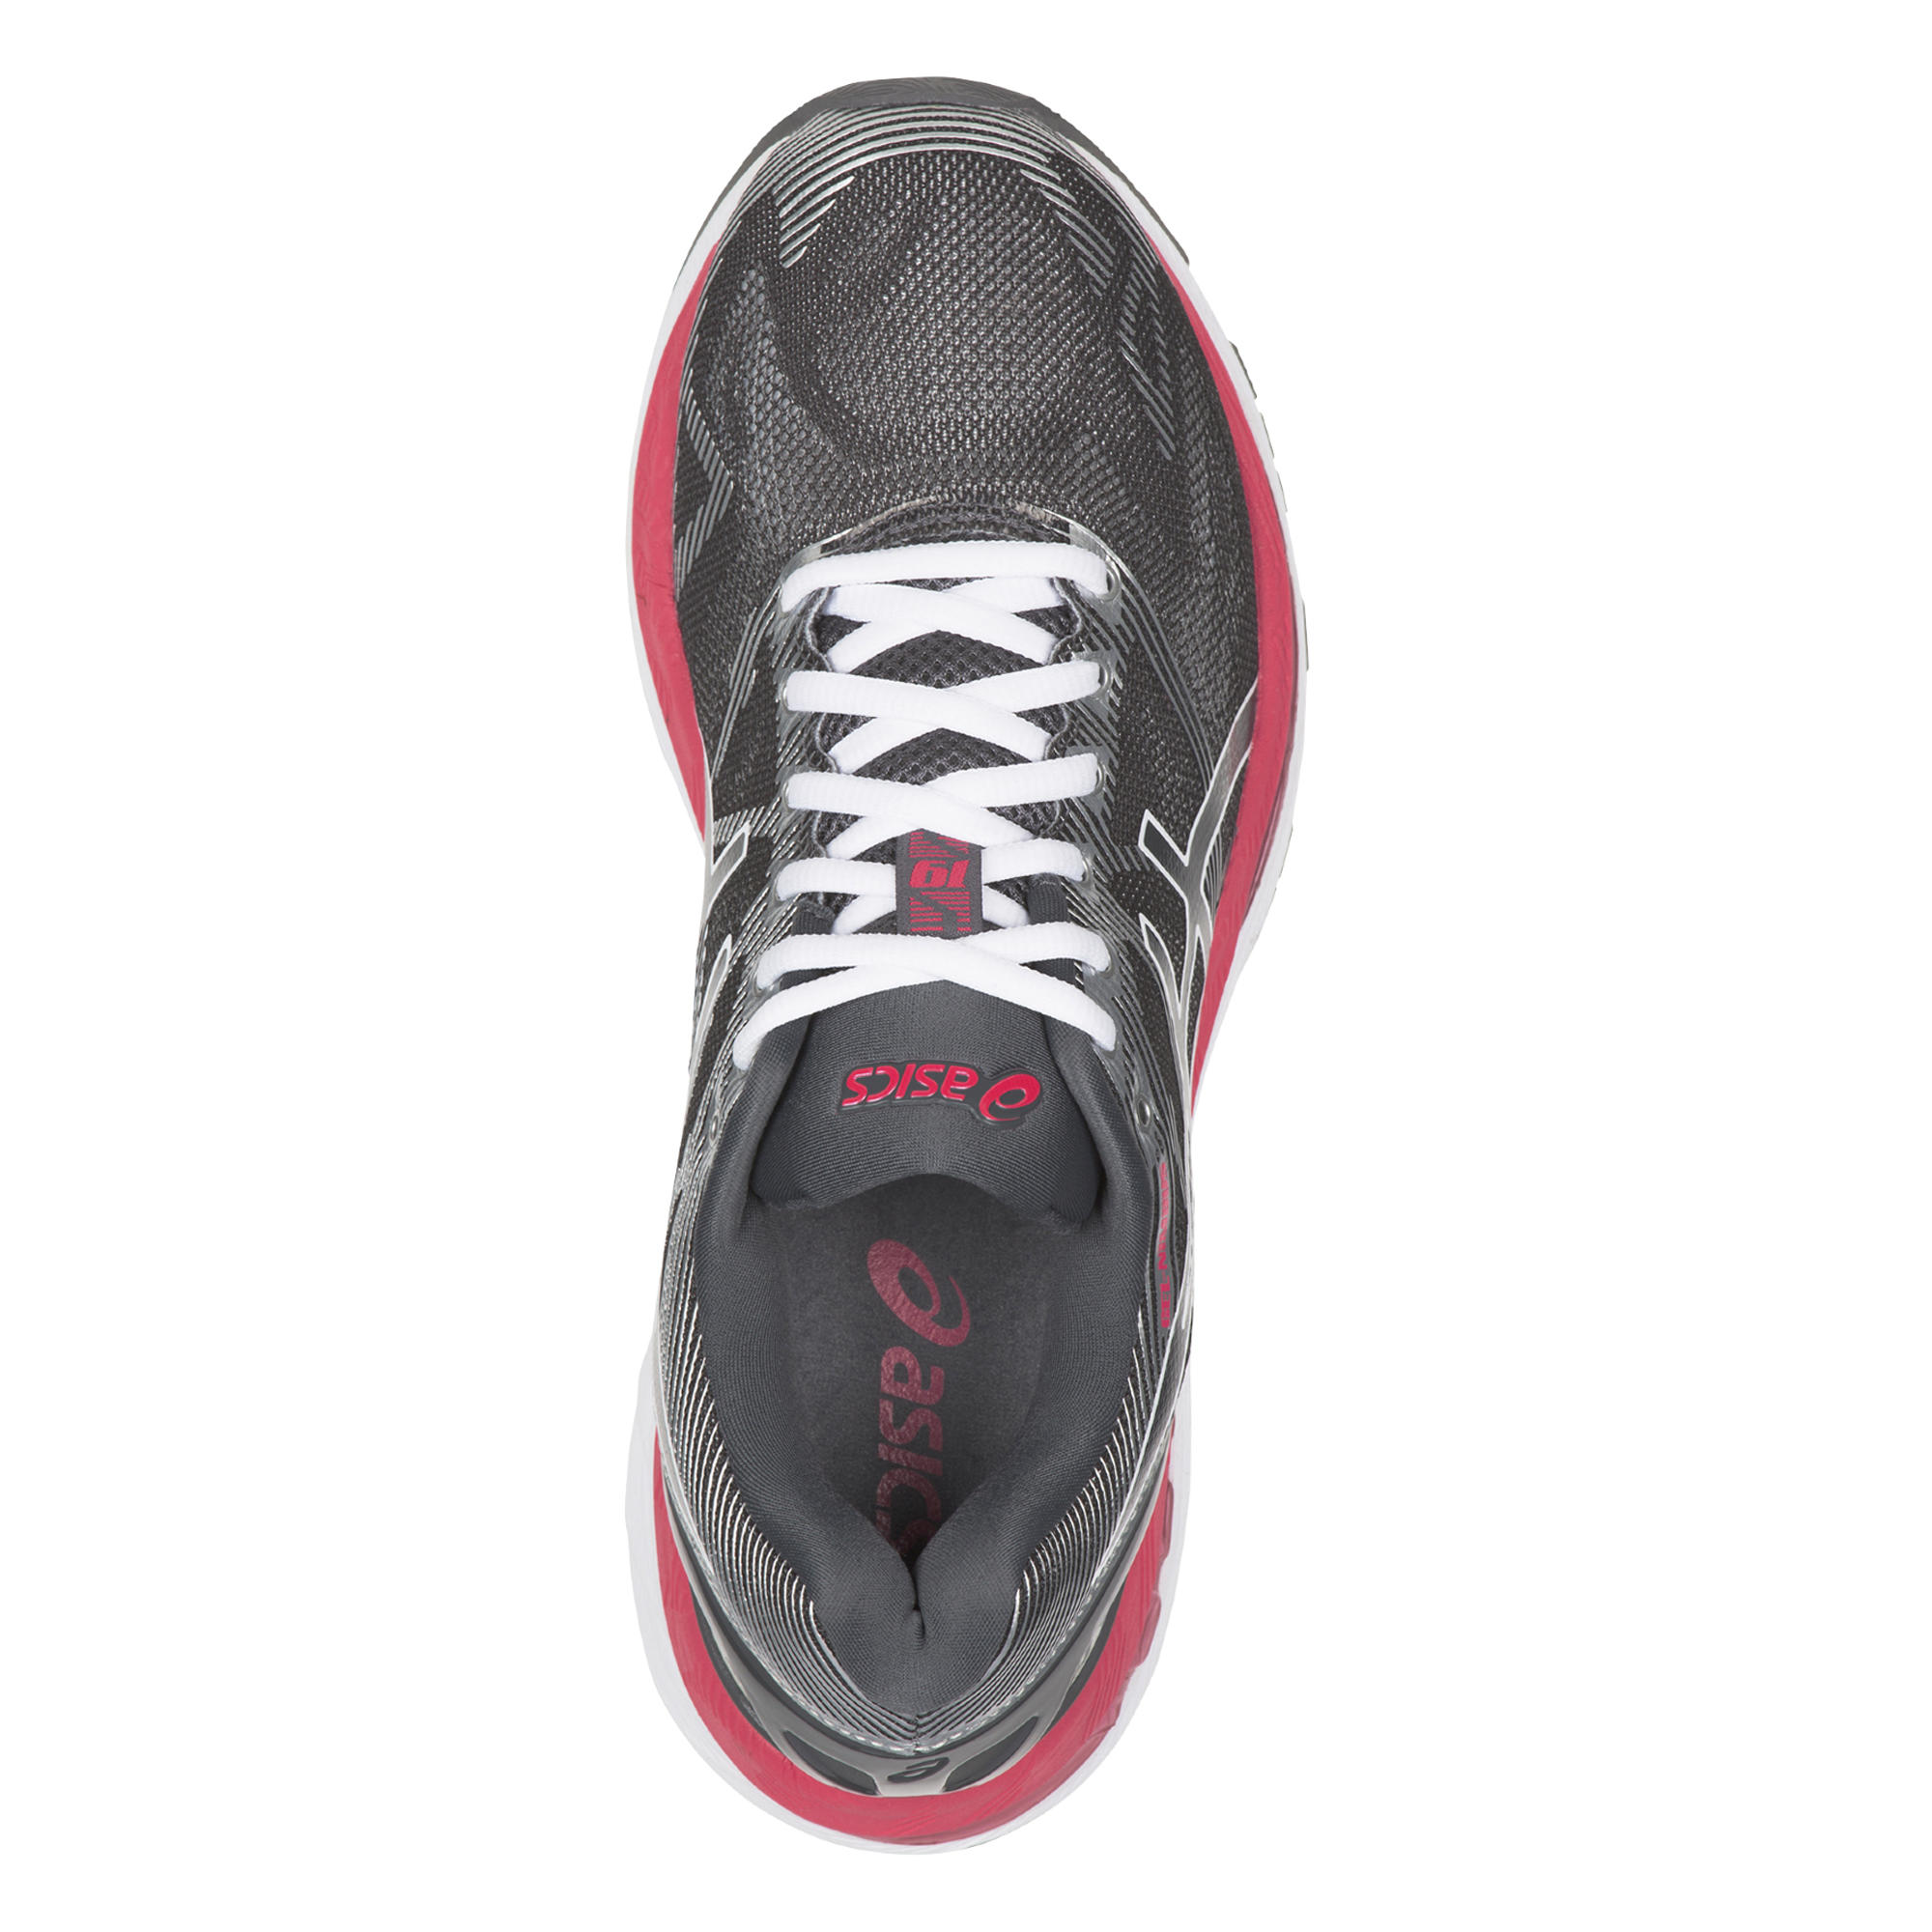 Asics 19 Nimbus Chaussures Running Gris Gel Femme Rhqtdsc SpqUzGMV